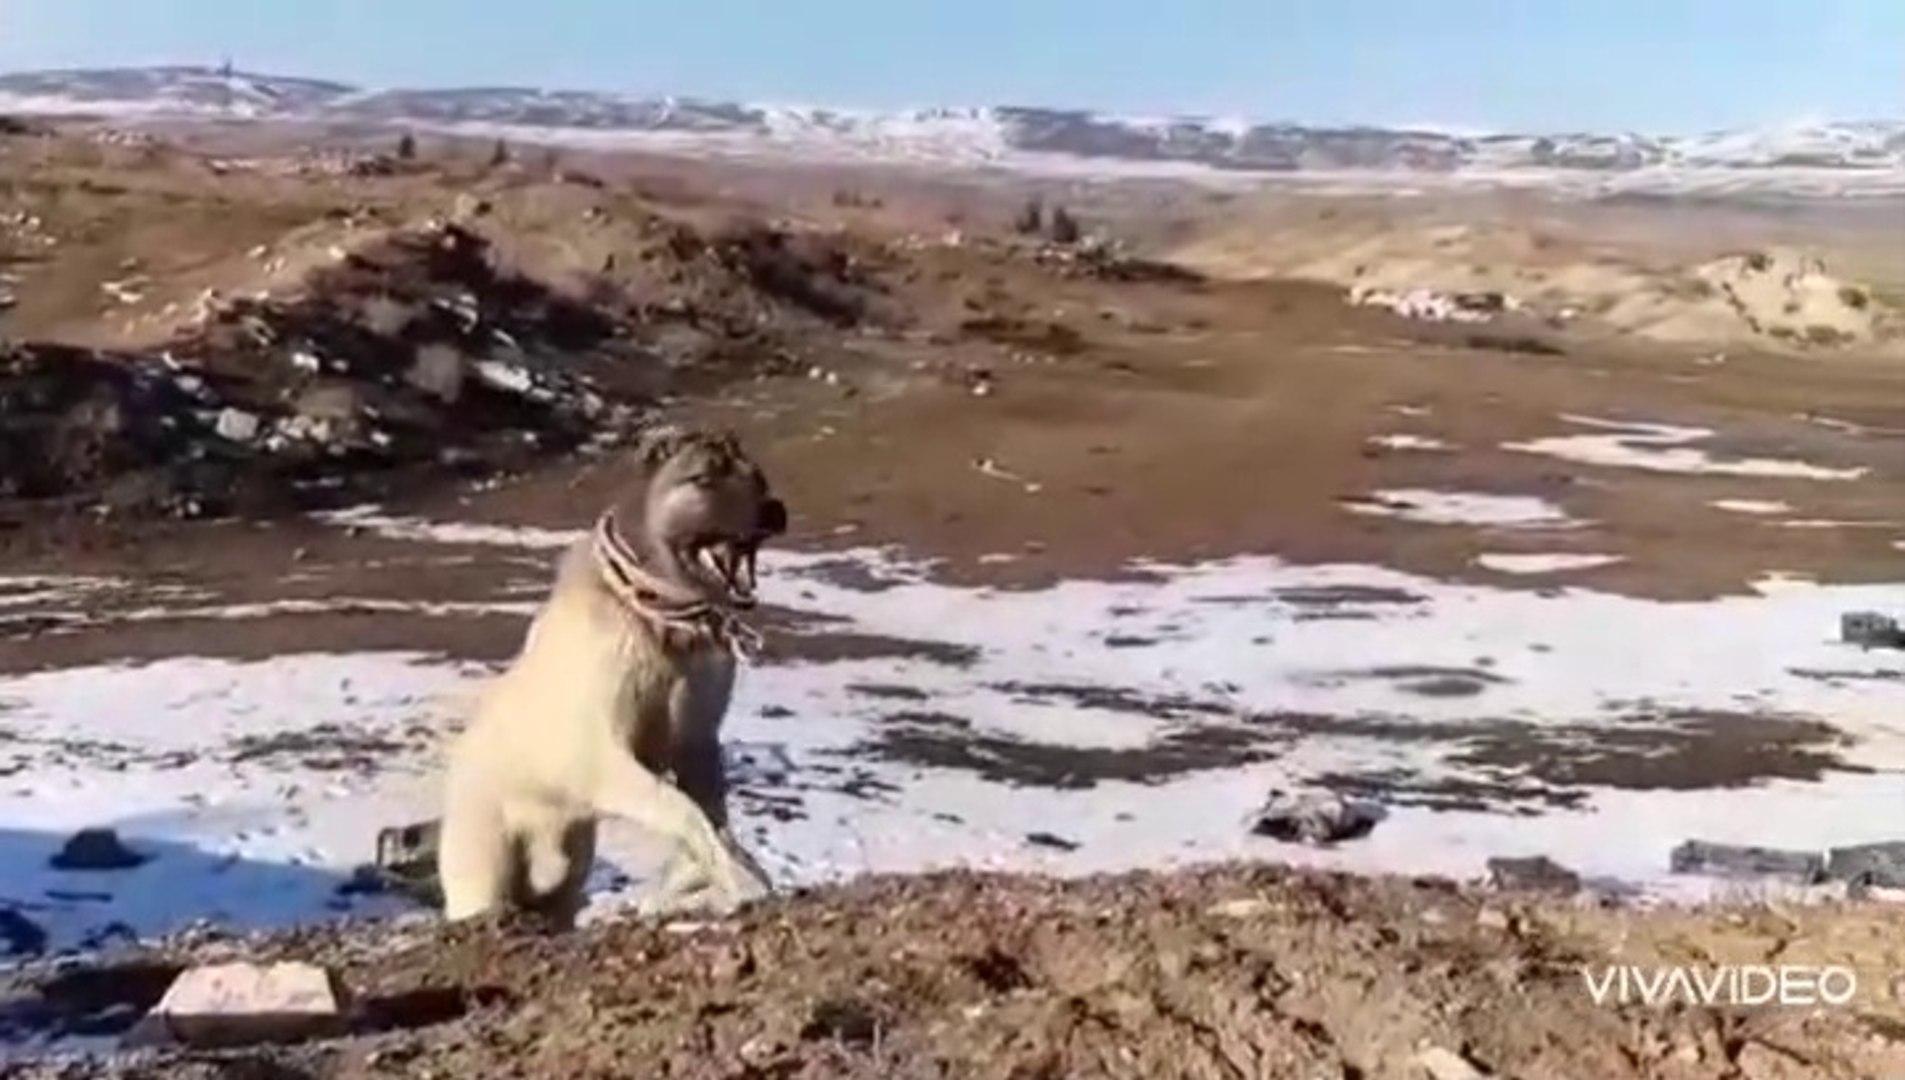 KANGAL KOPEGiNiN ZiRVEYE CIKISI - KANGAL SHEPHERD DOG